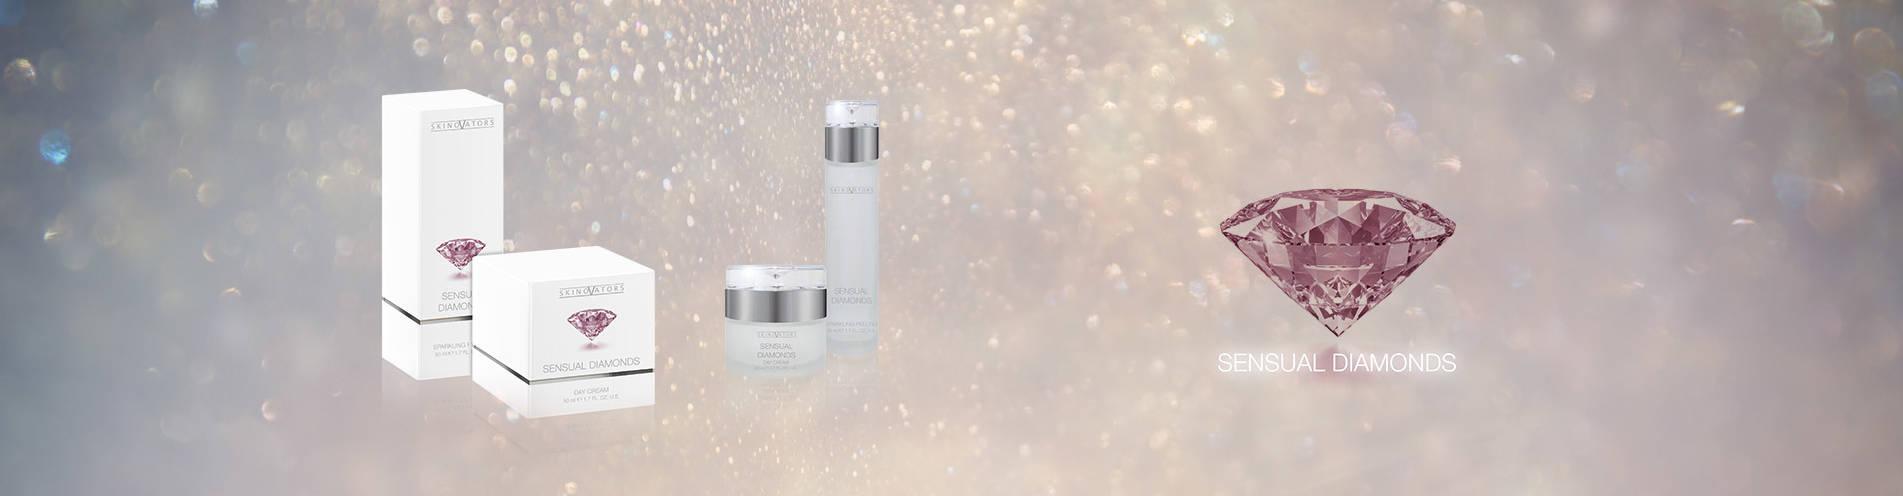 SKINOVATORS GmbH | Private Label Cosmetics and Skin Care Germany